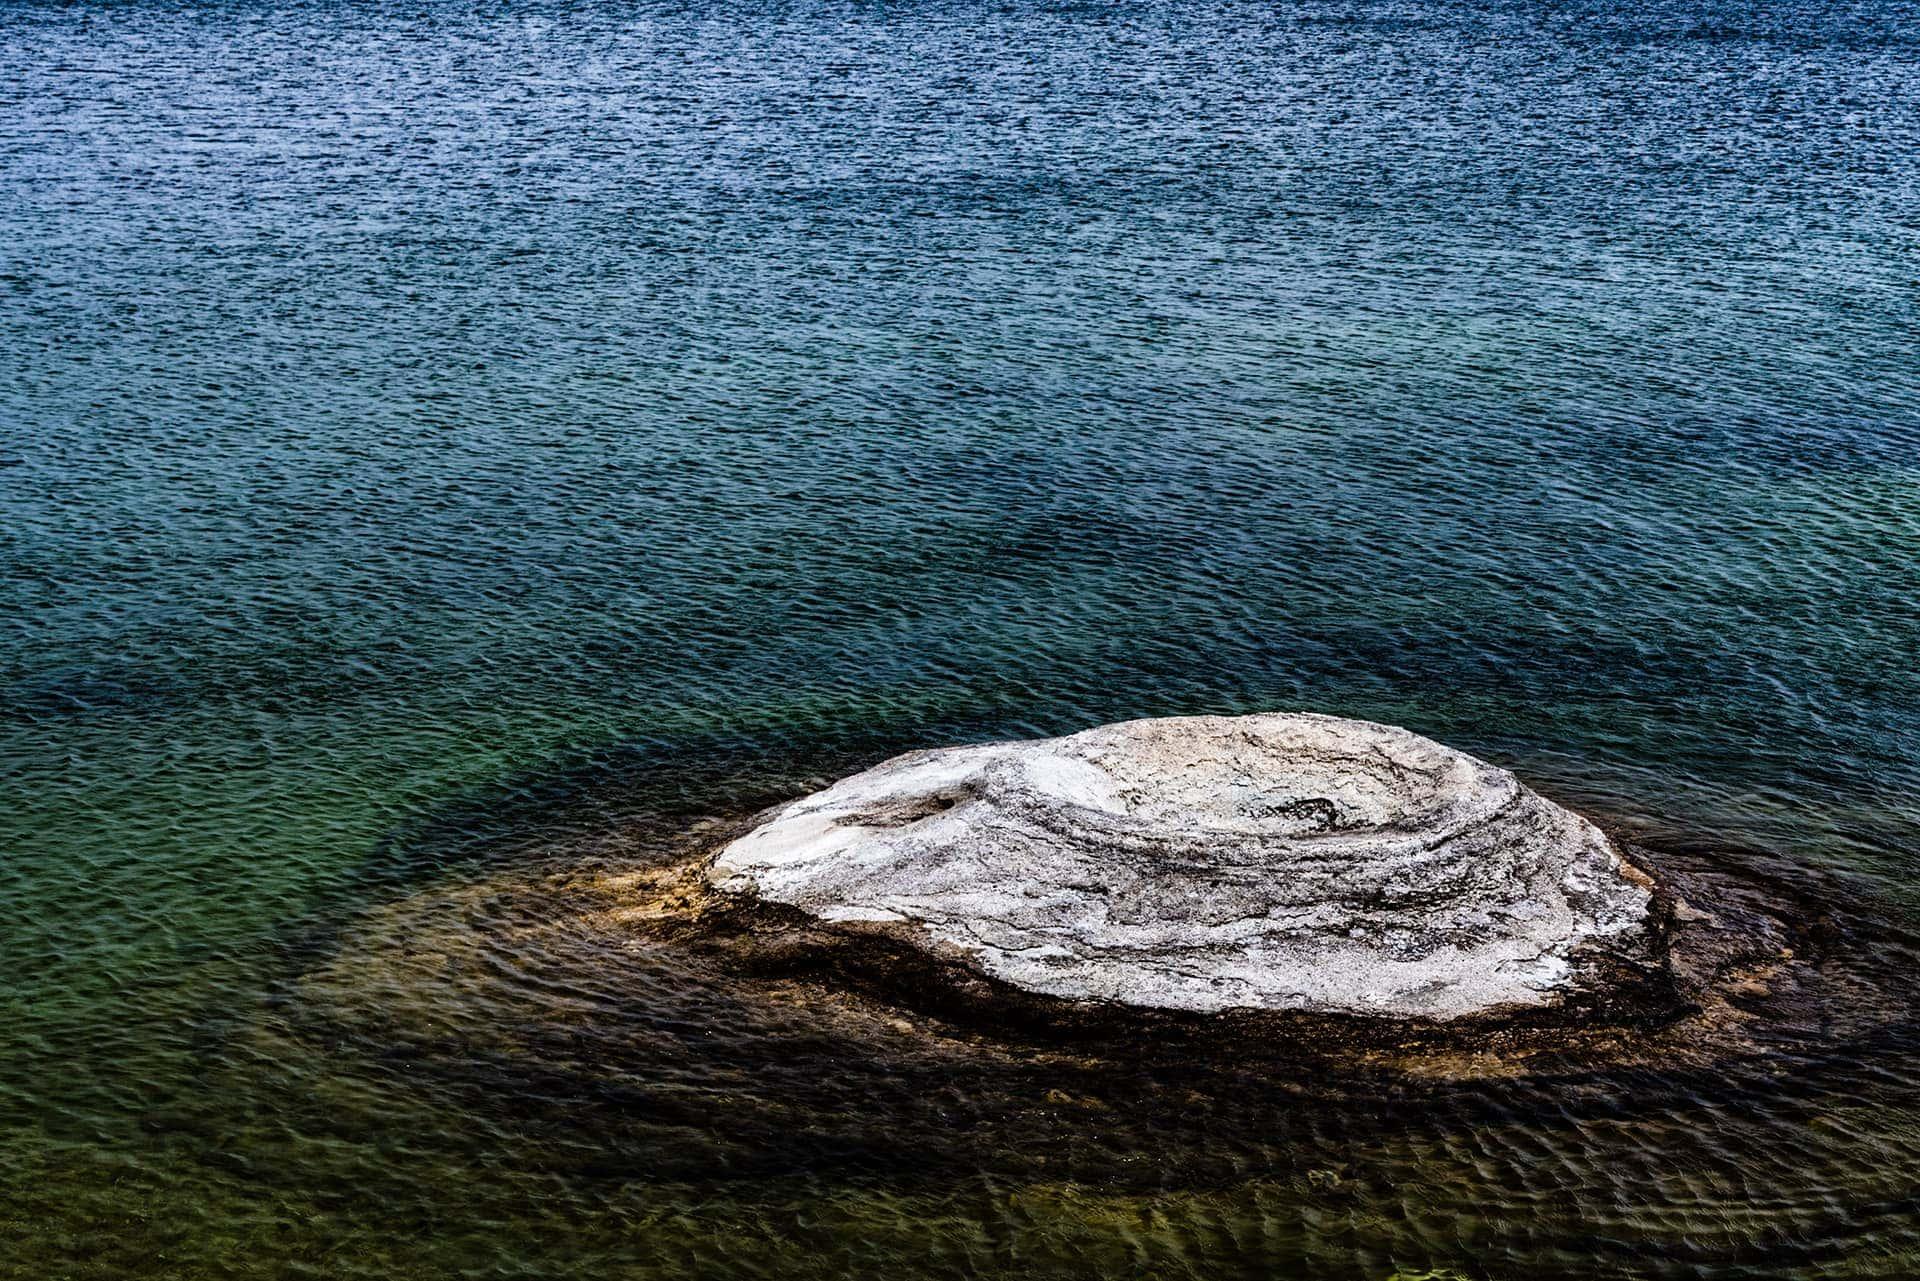 artnorama - Tiny Isle